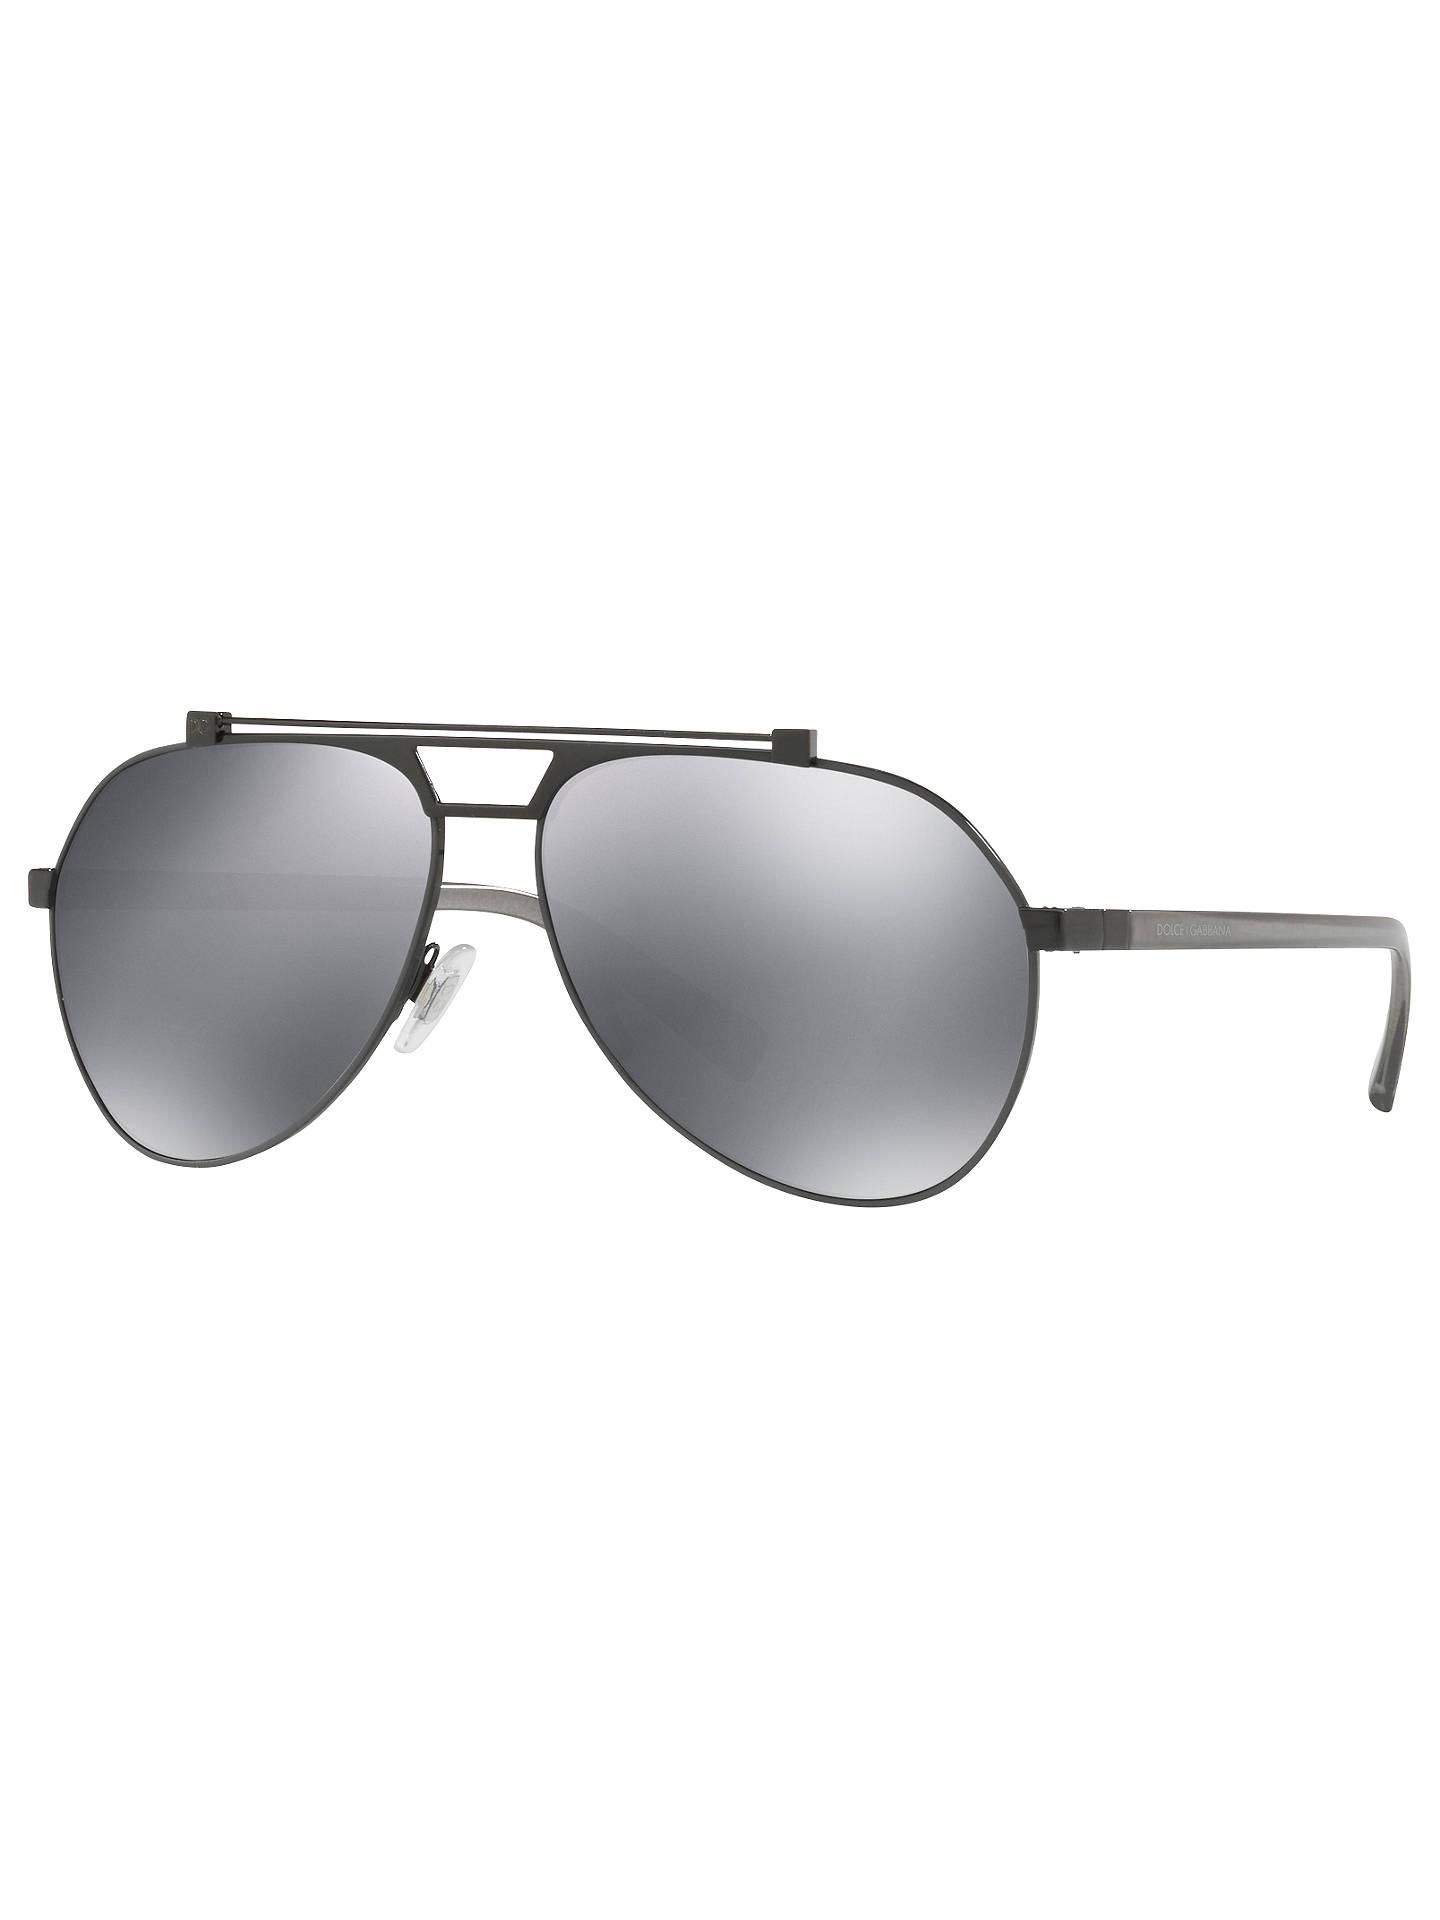 bacb76b2aa5 Dolce   Gabbana DG2189 Aviator Sunglasses at John Lewis   Partners